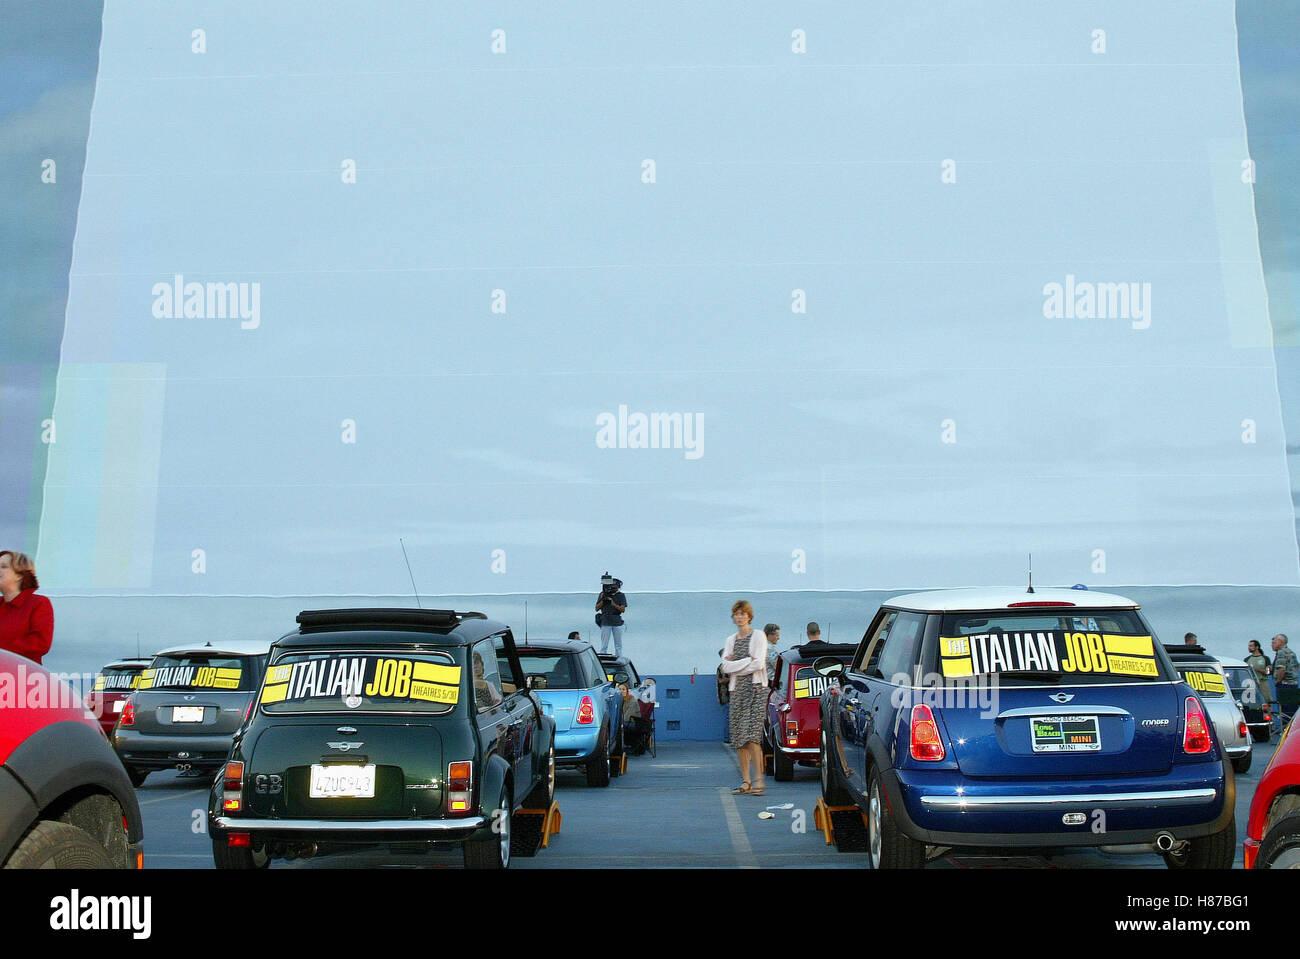 MINI AT die Drive-in Kino-MINI fahren IN den PARAMOUNT STUDIOS HOLLYWOOD LOS ANGELES USA-PREMIERE 20. Mai 2003 Stockbild